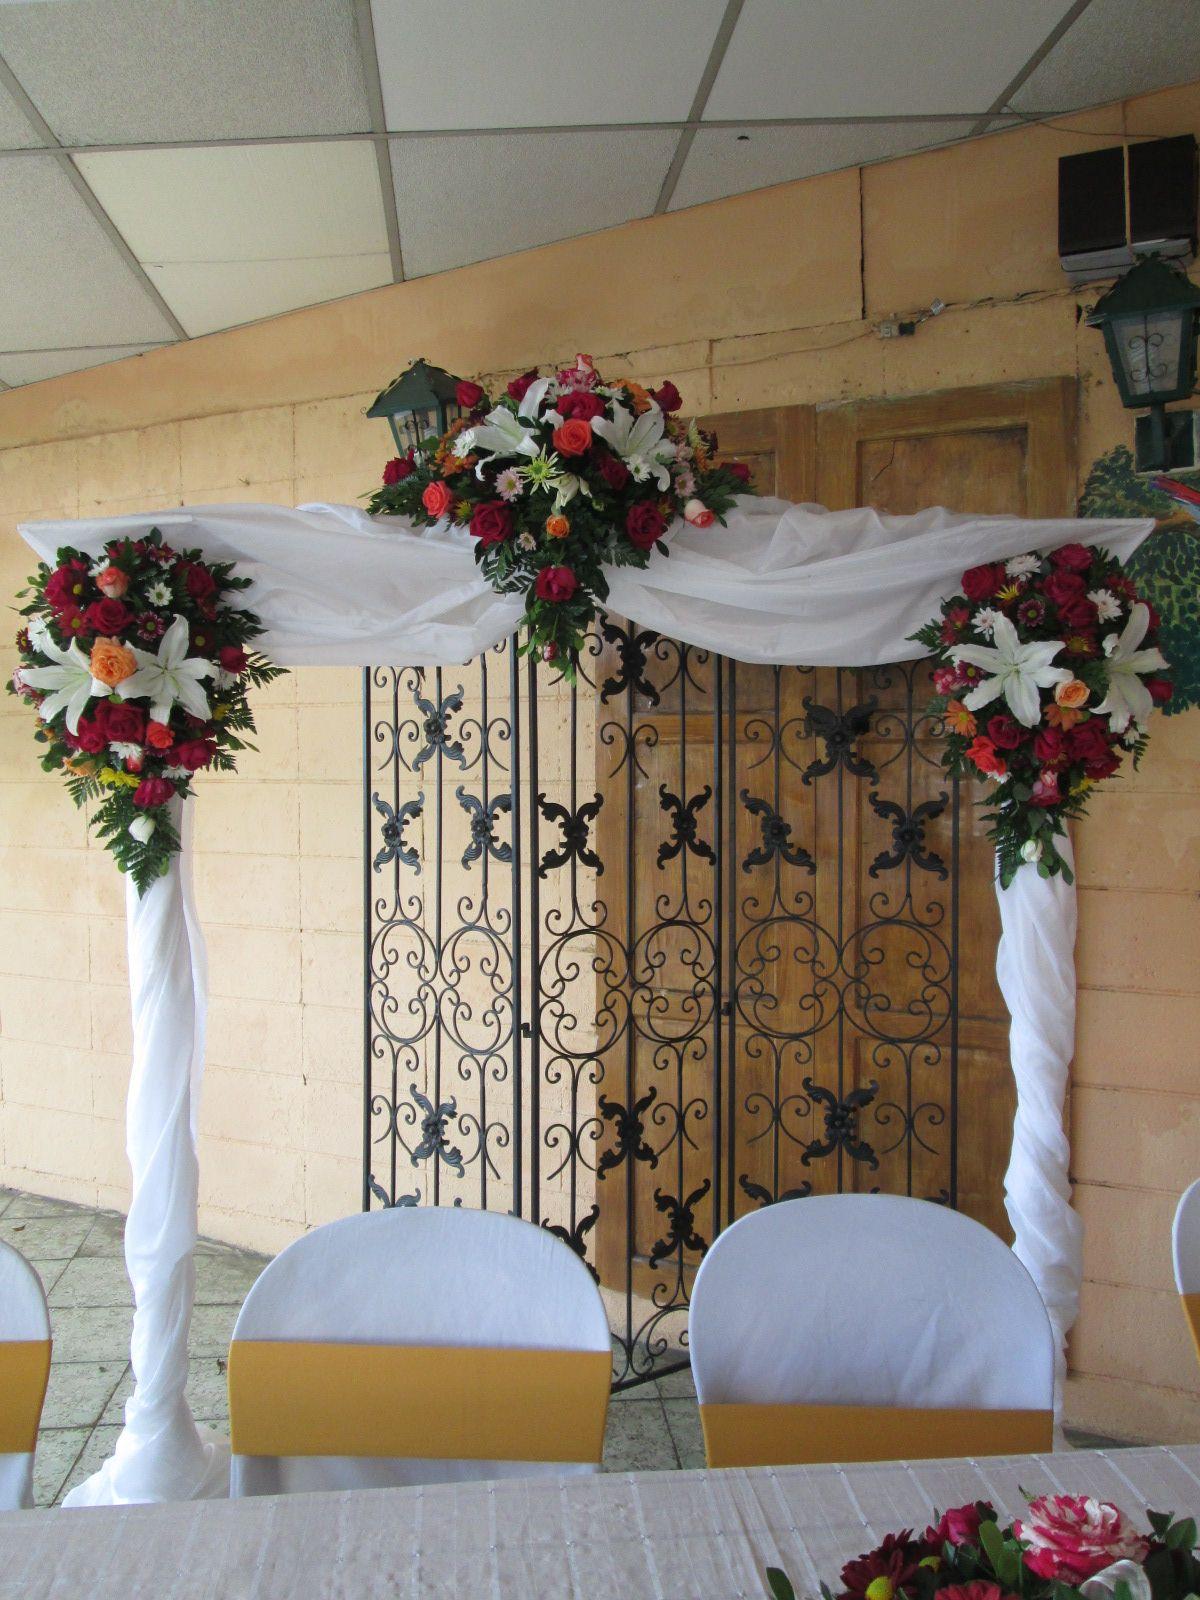 36+ Decoracion de pergolas para bodas ideas in 2021